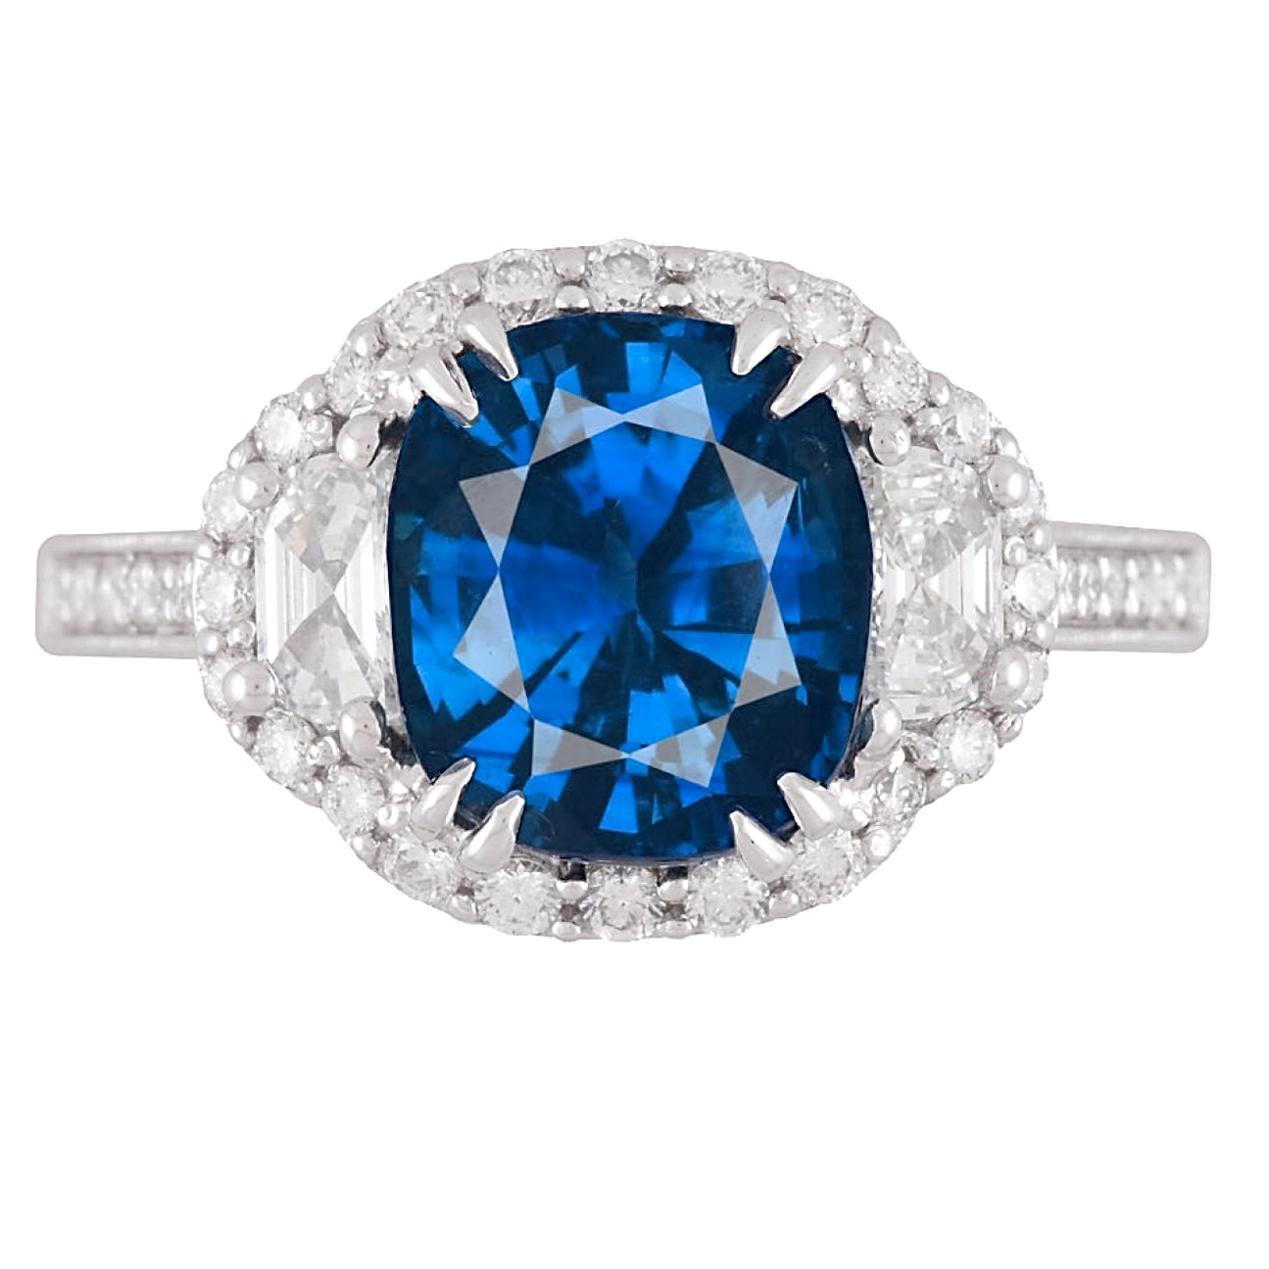 DiamondTown GIA Certified 3.28 Carat Vivid Blue Sapphire Ring